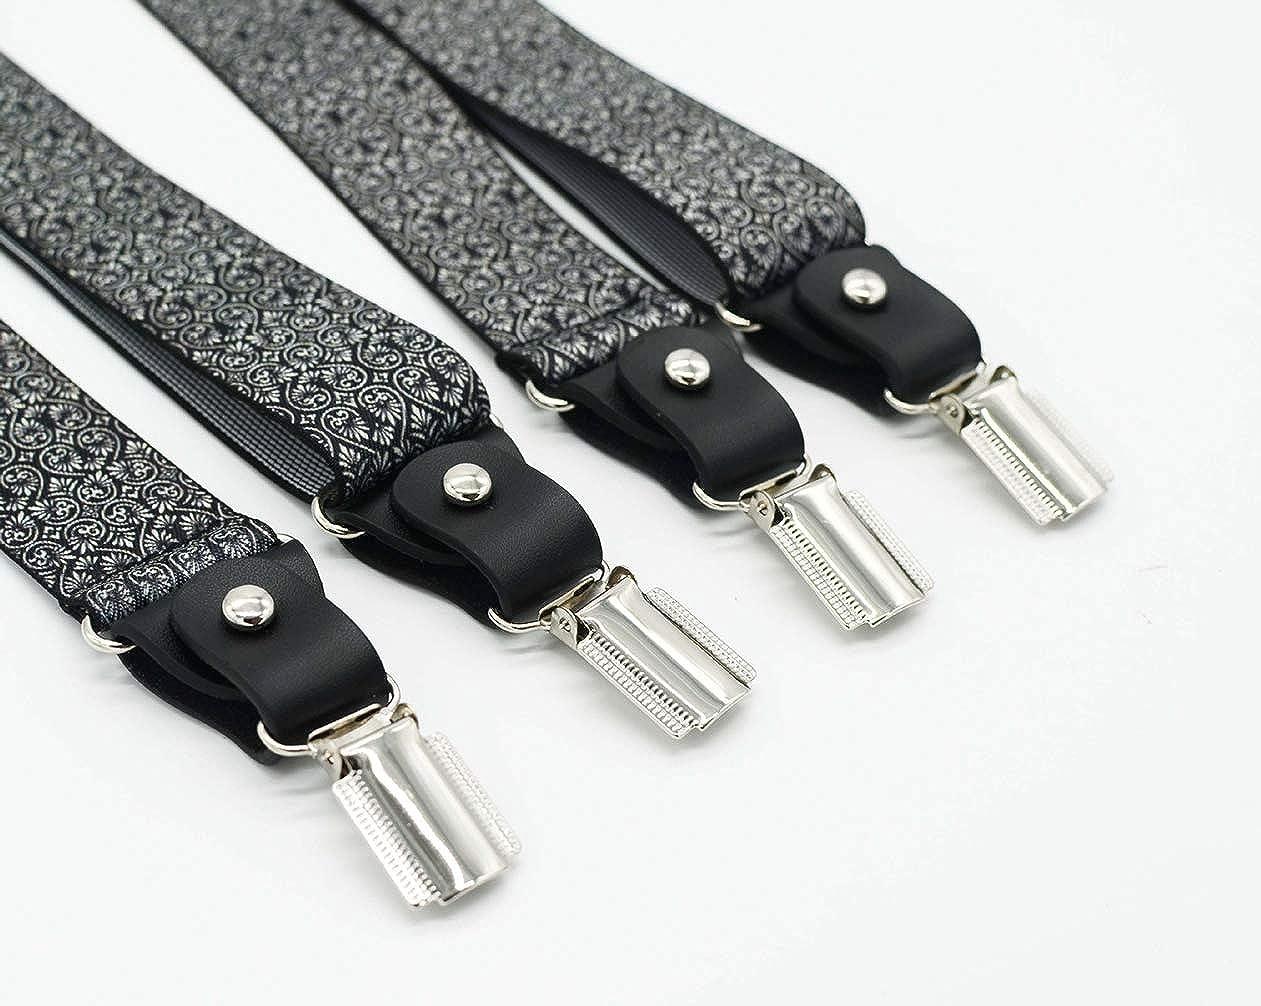 SupSuspen Mens No-cross Style 4 Clips Suspenders 1.4 Inch Wide Heavy Duty Braces